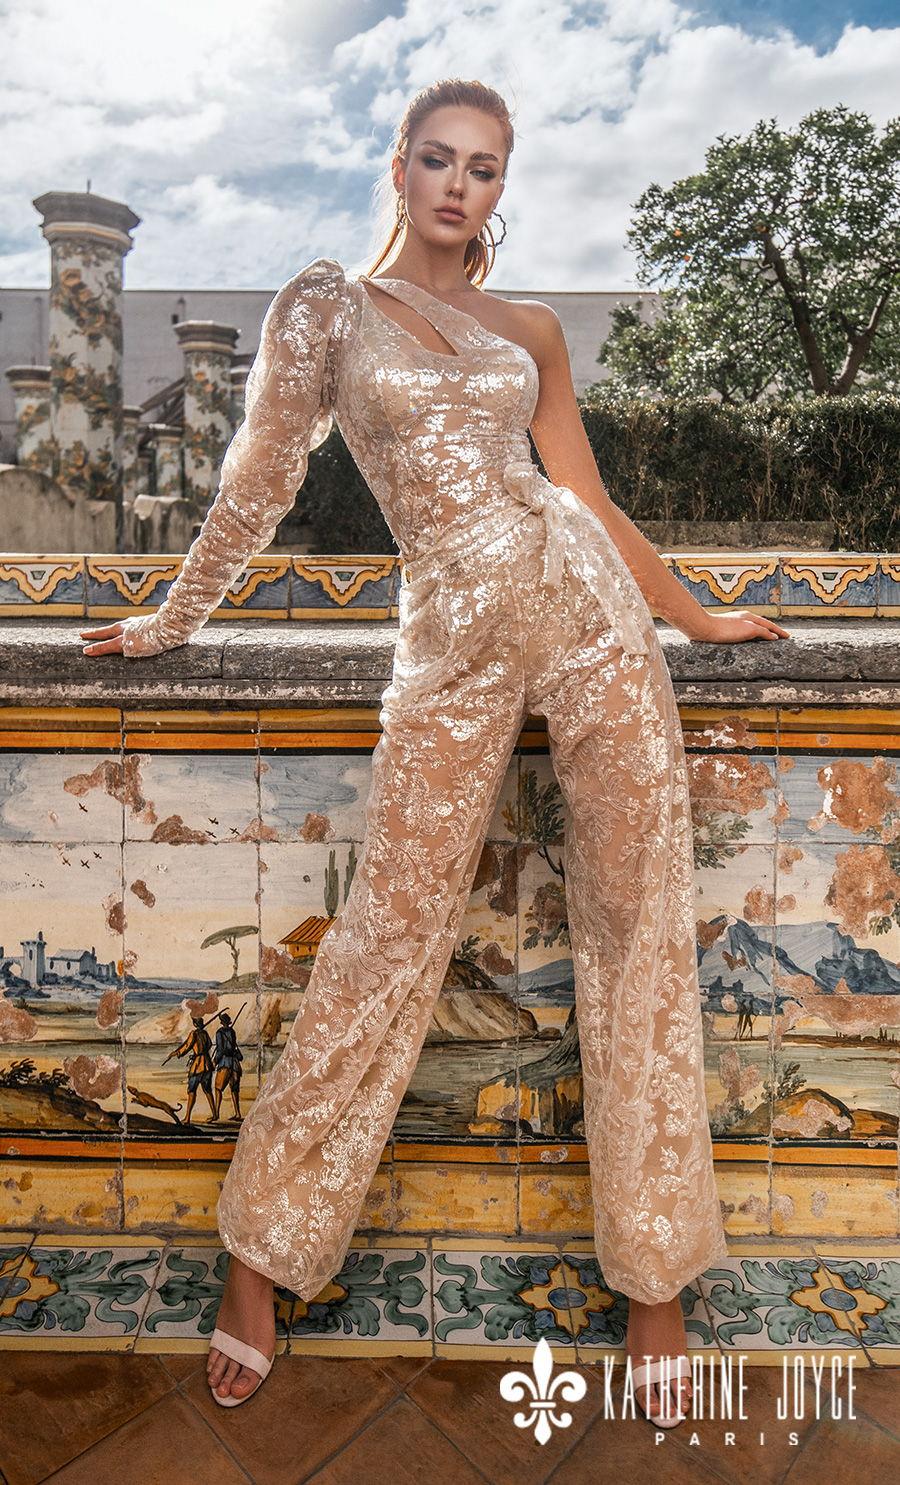 katherine joyce 2021 naples bridal one shoulder long sleev full embellishment glamorous golden jumpsuit wedding dress (manila) mv